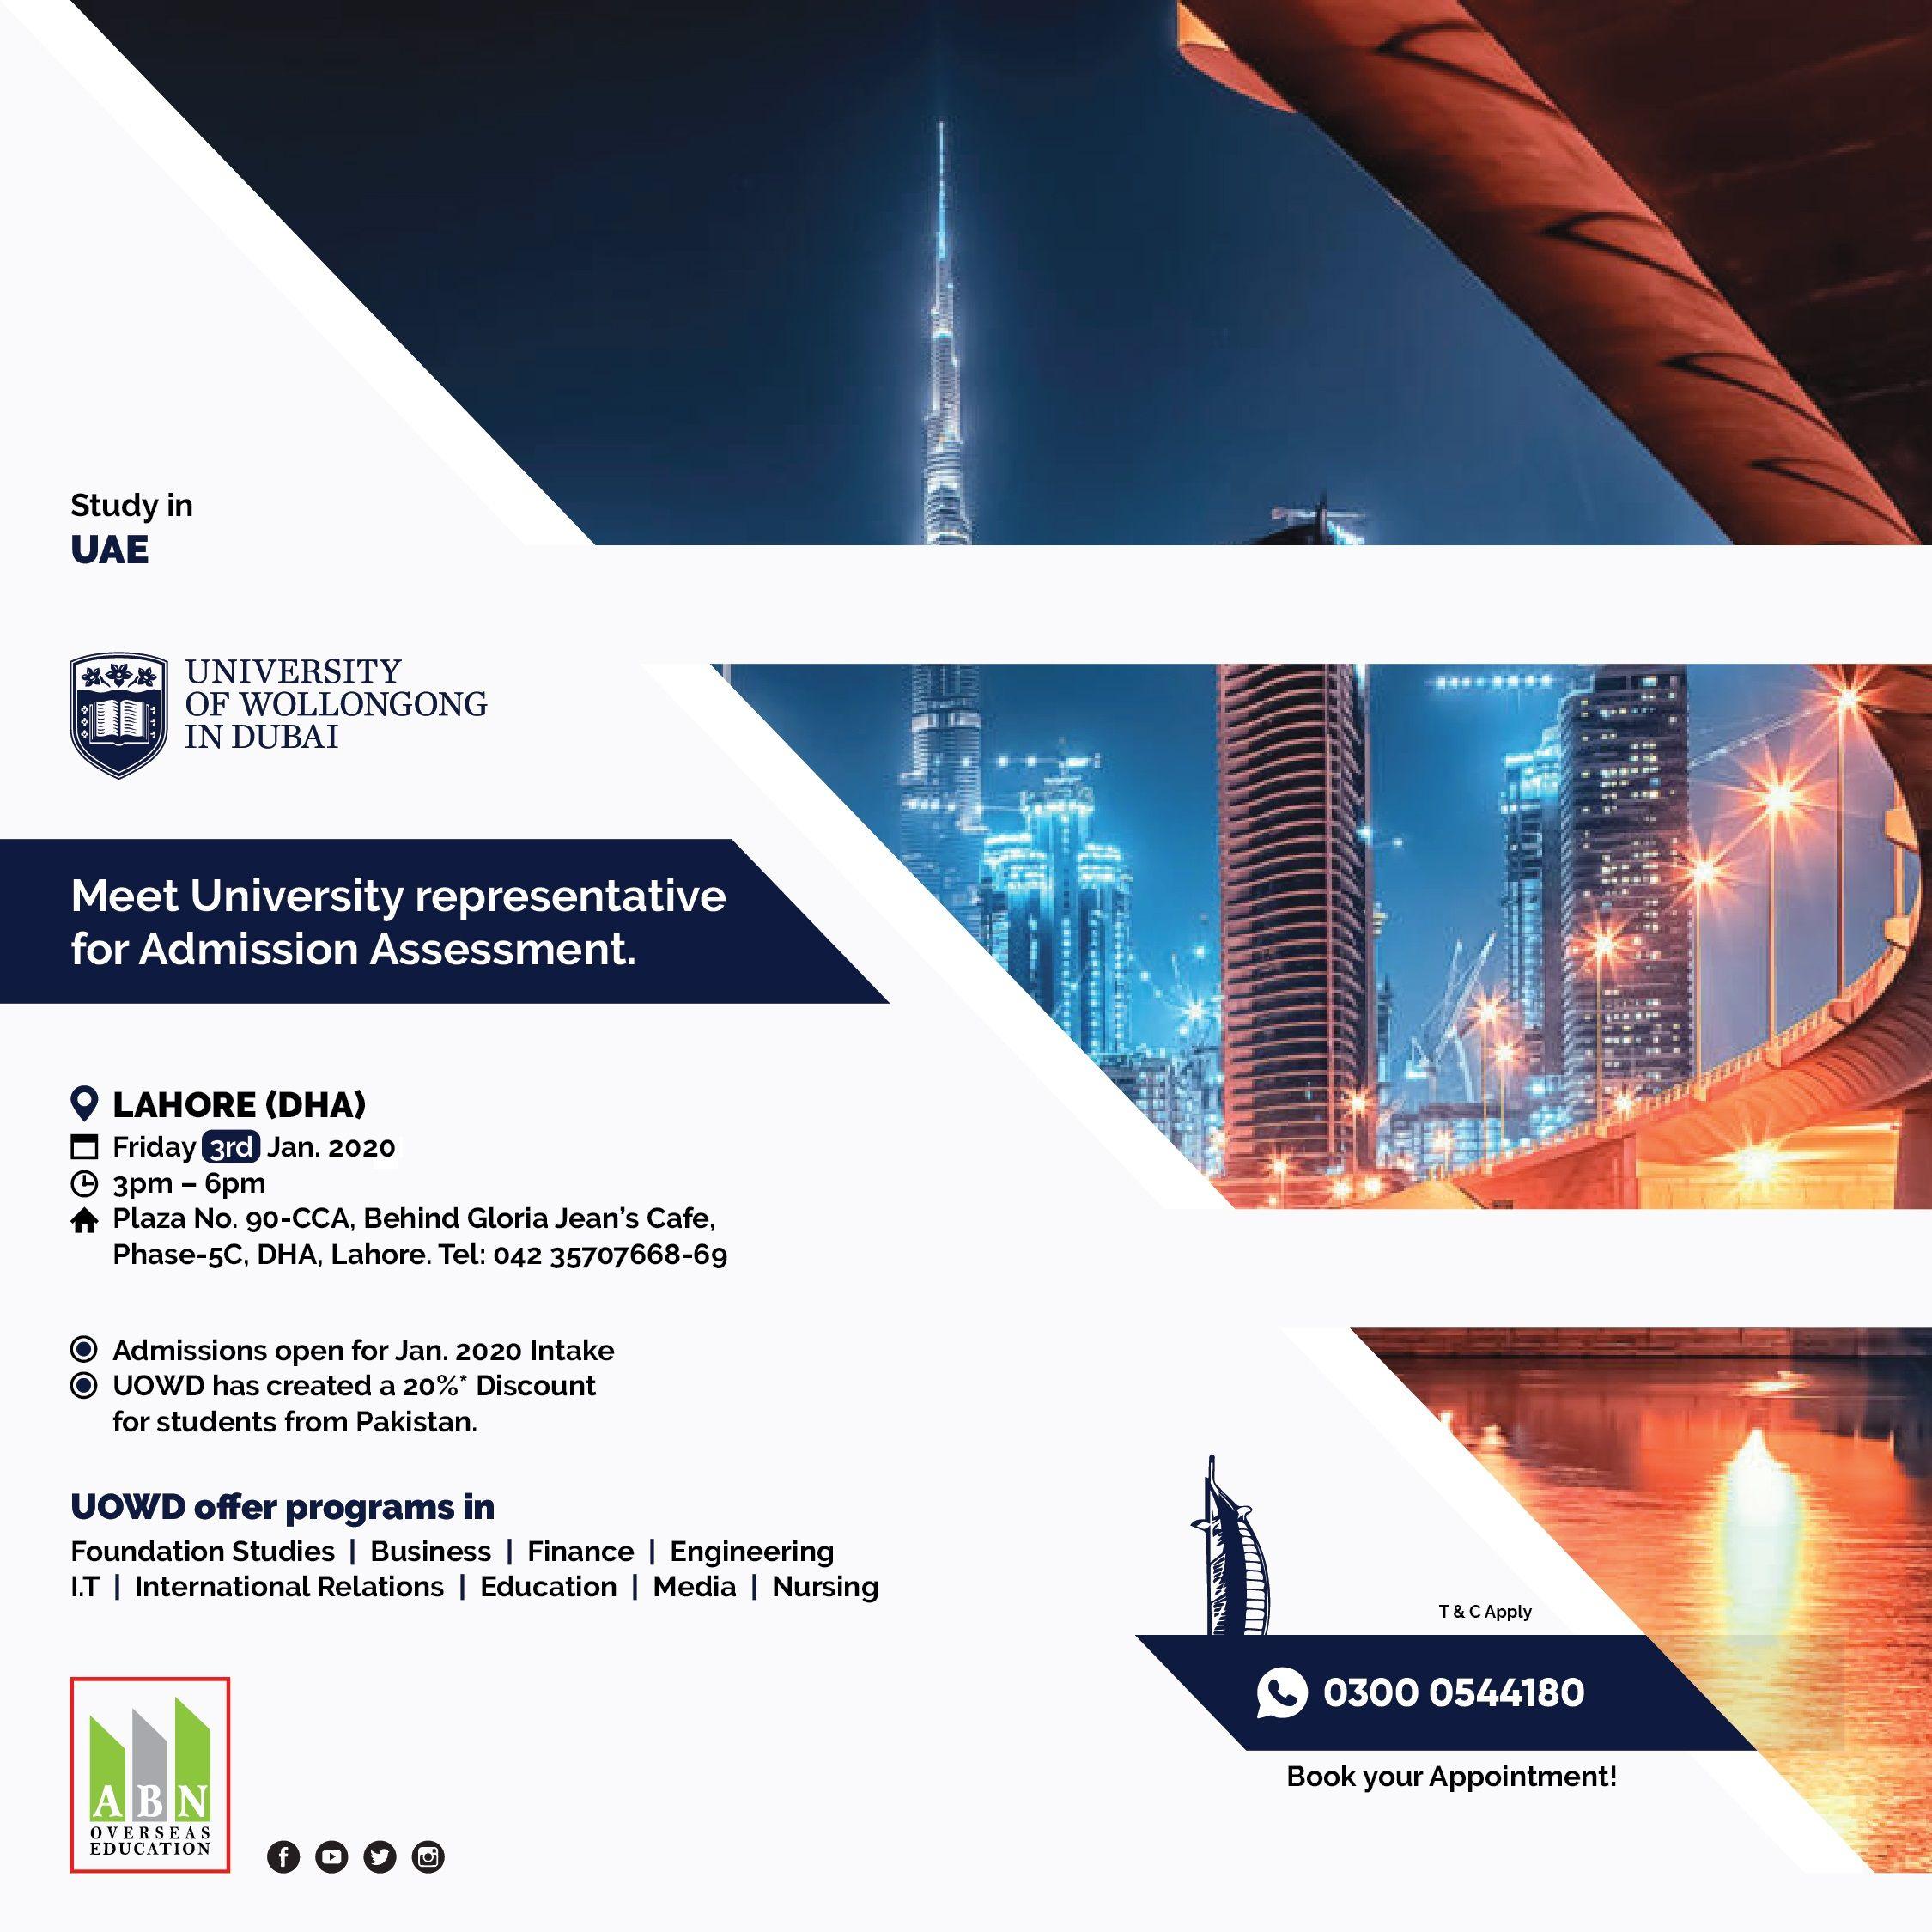 45664ae8ad7d9f829c18db12ea1bc9d3 - Australian University Application Deadline 2020